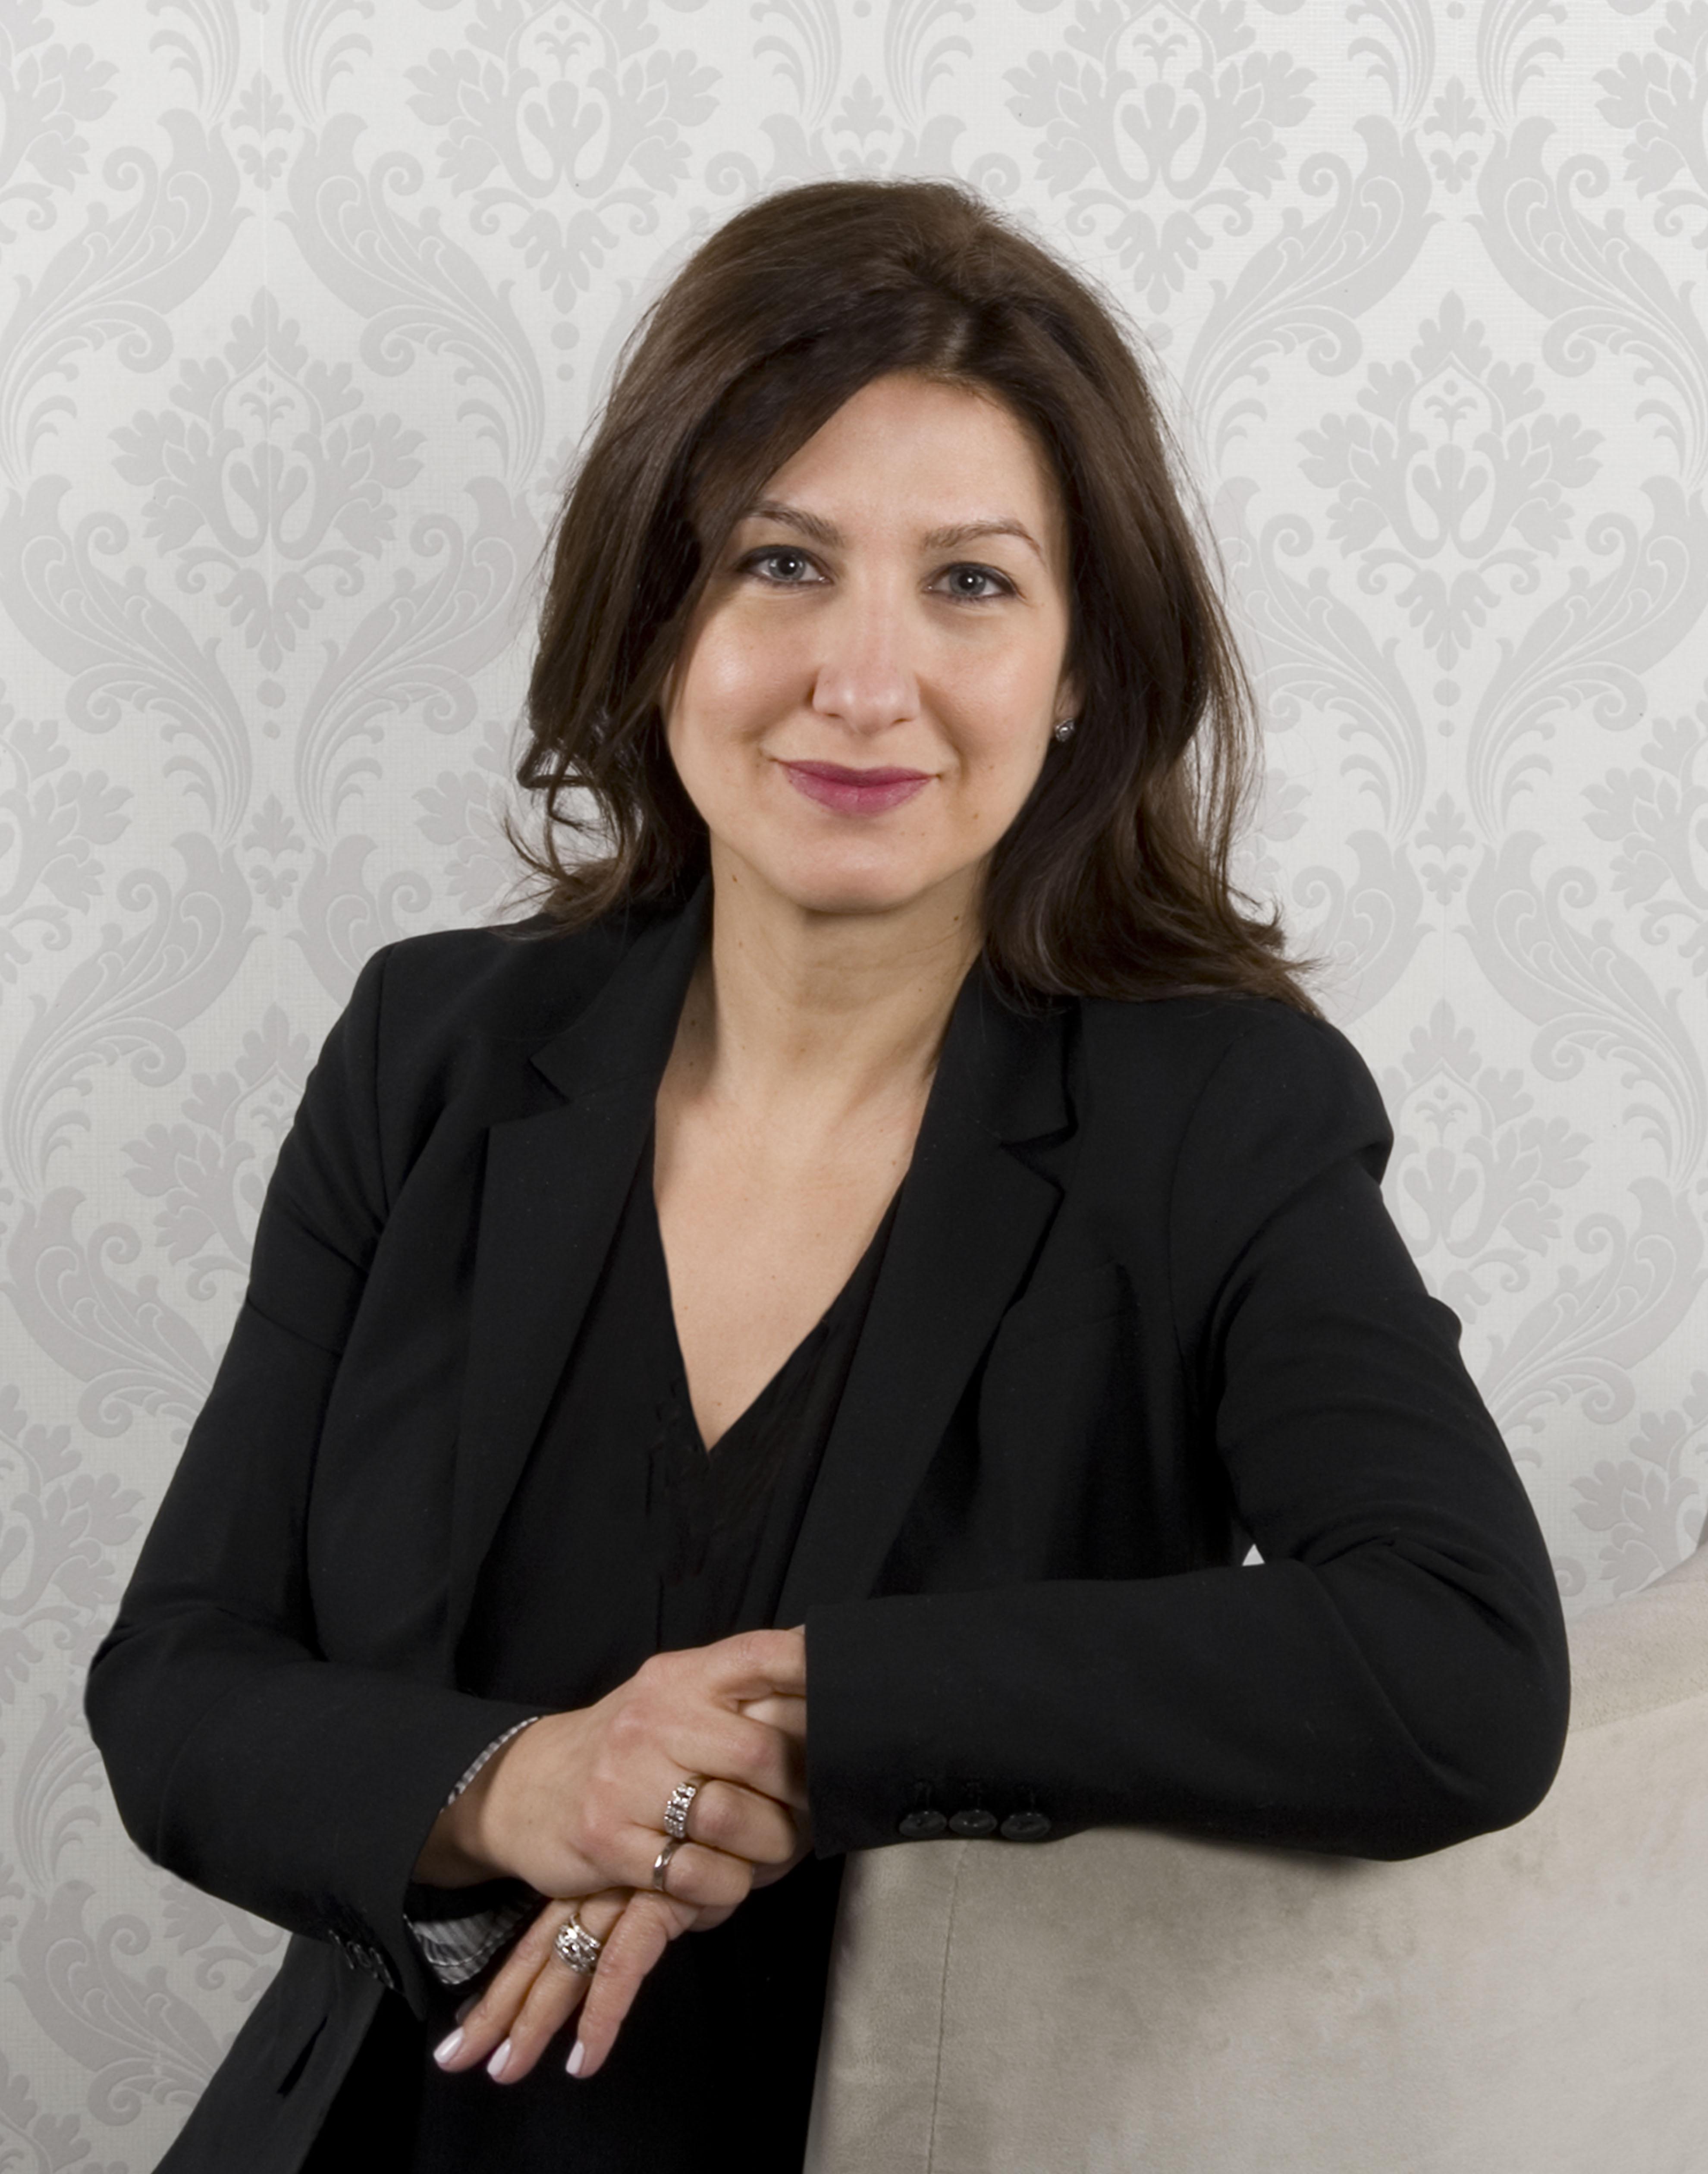 Francesca Ottoni Photo